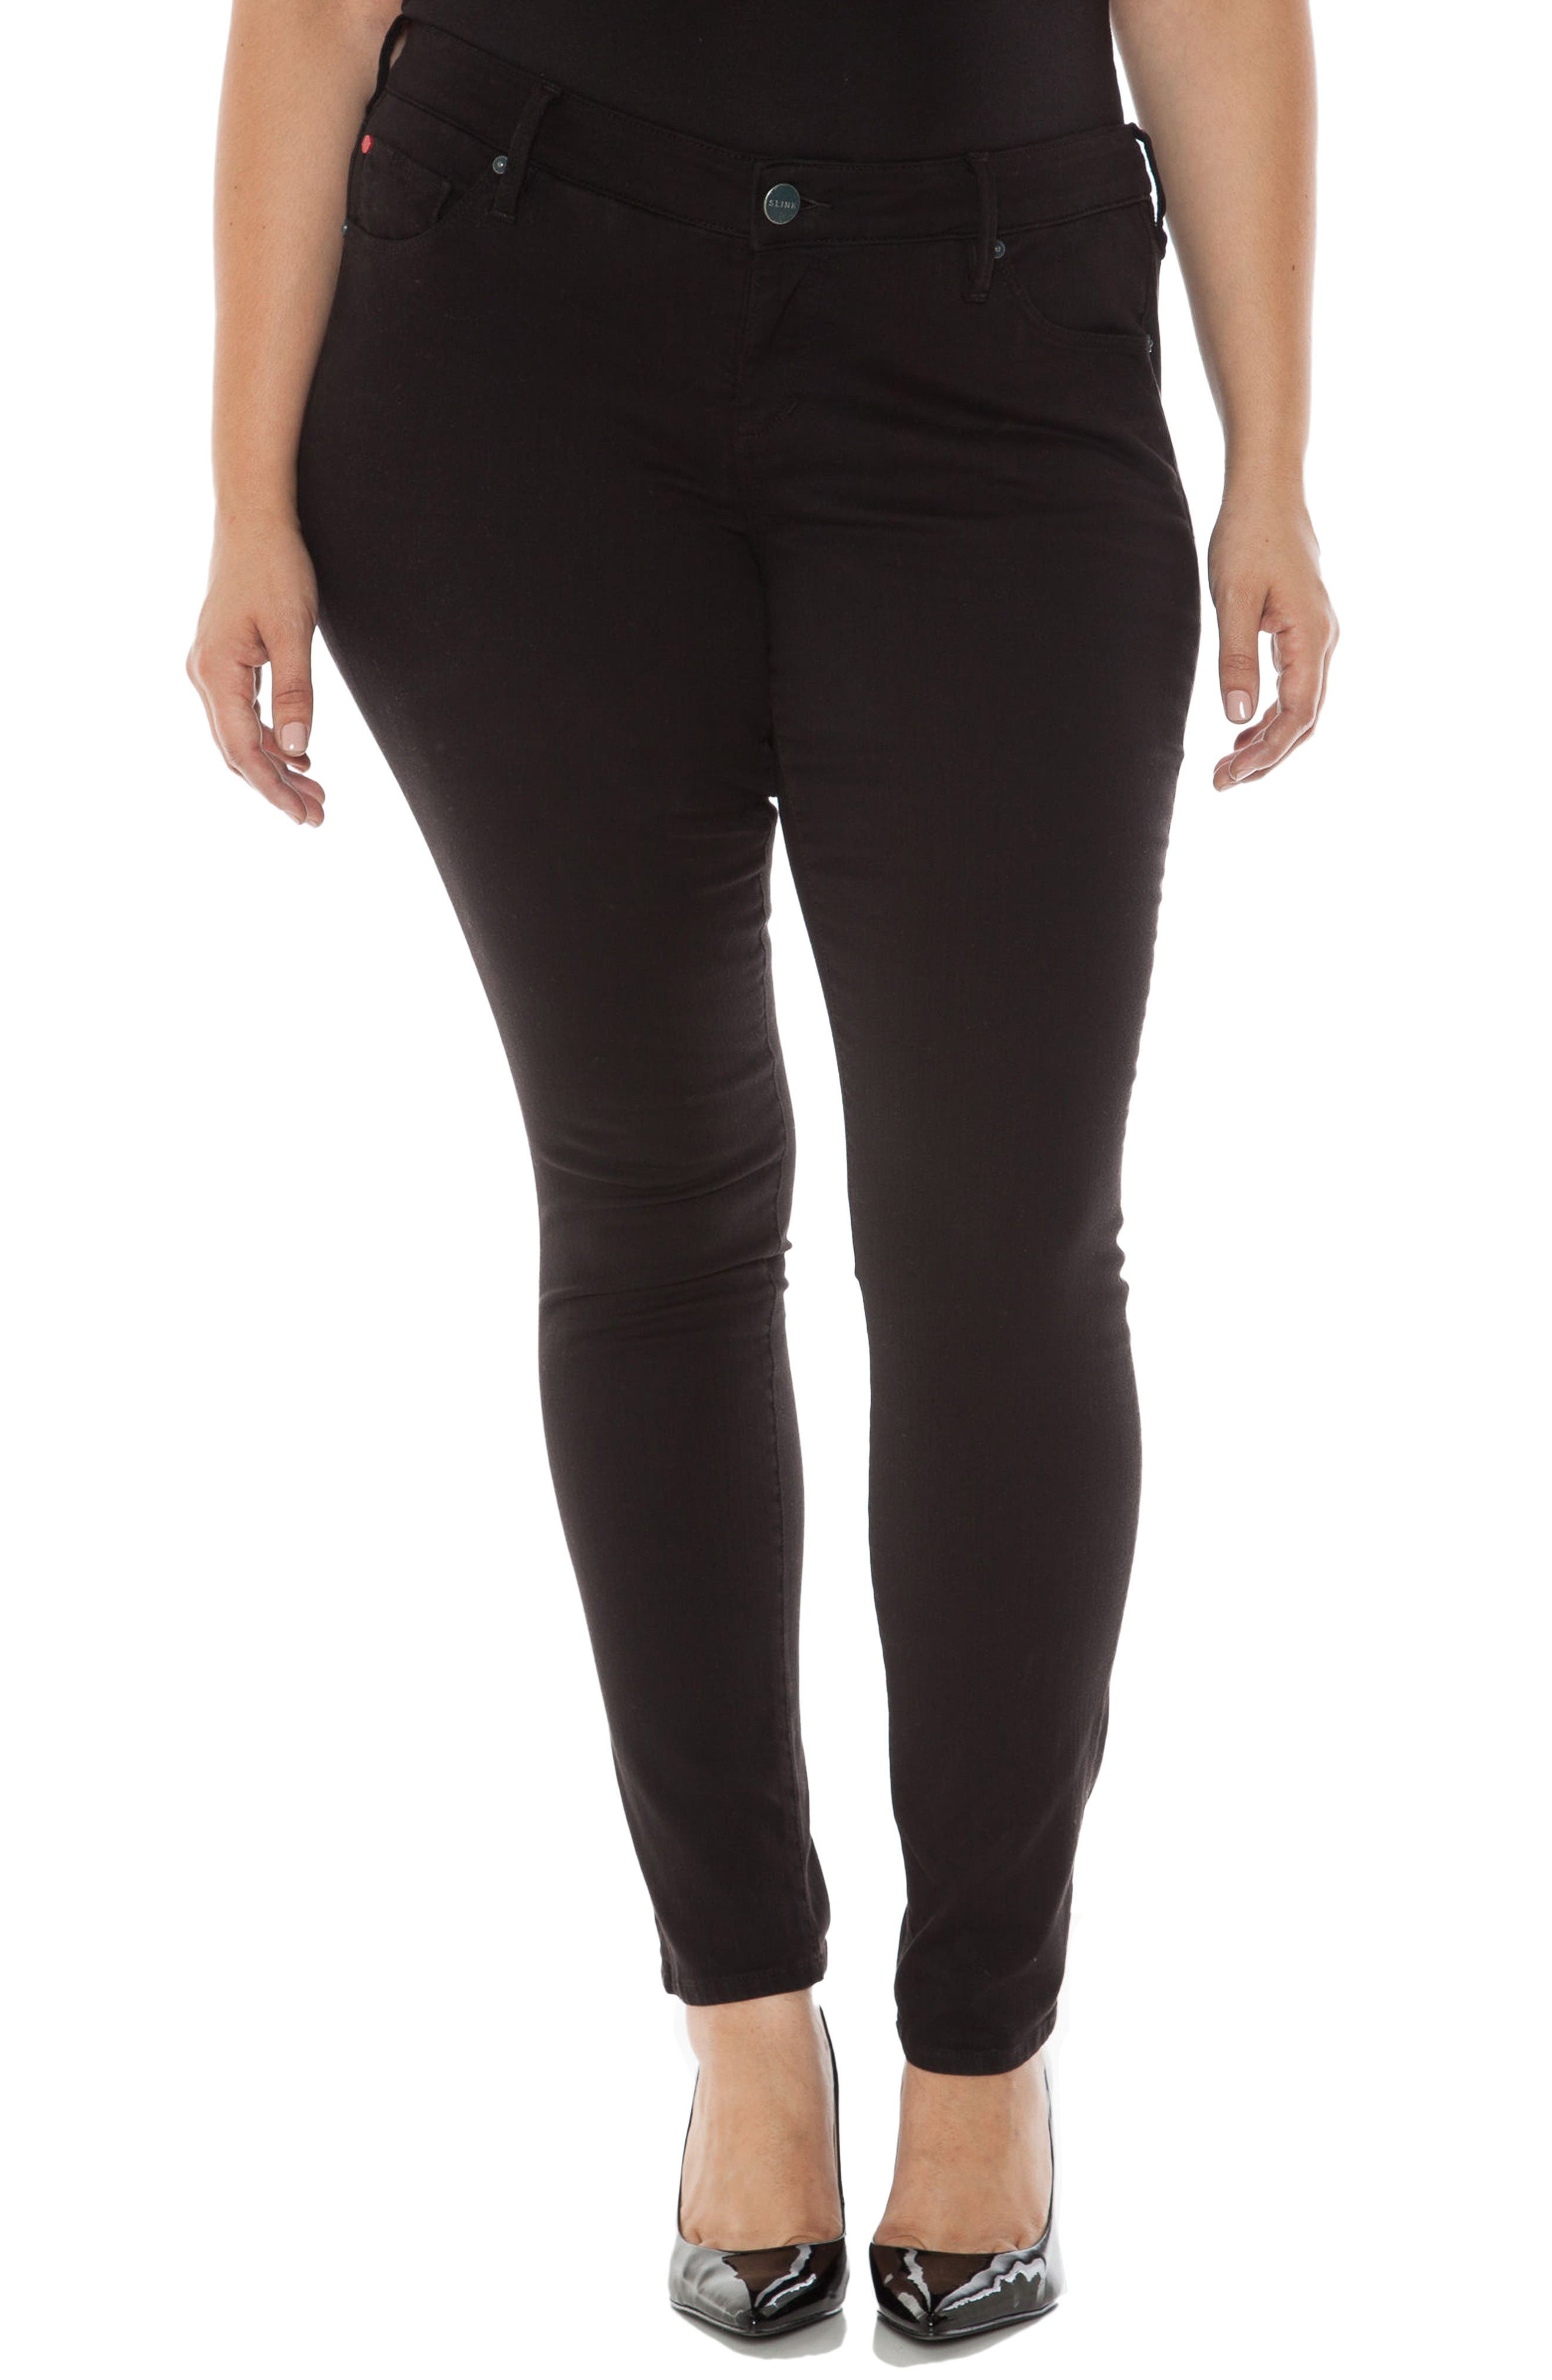 Alternate Image 1 Selected - SLINK Jeans 'The Skinny' Stretch Denim Jeans (Danielle) (Plus Size)